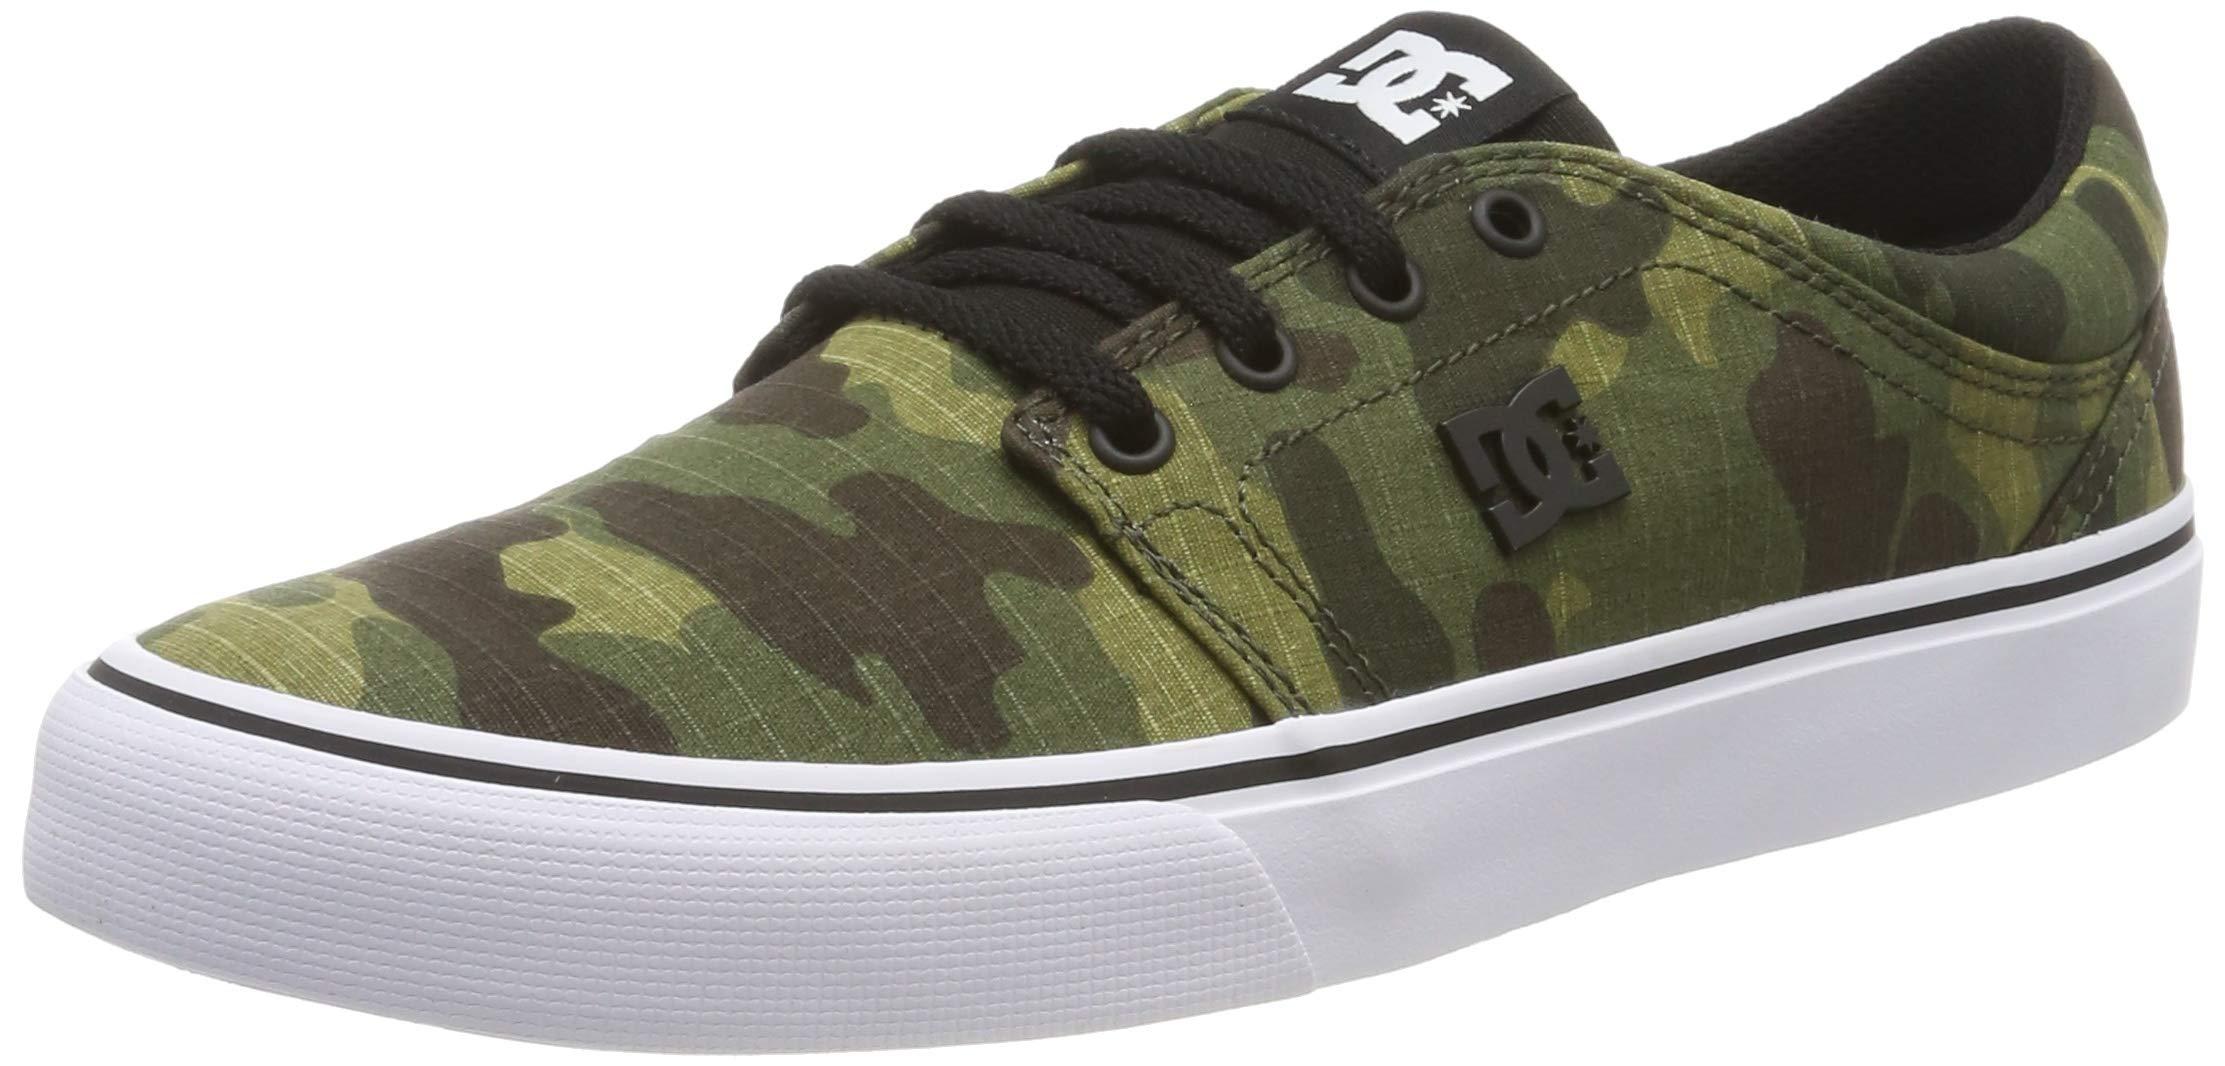 Dc Hommecamo36 Eu shoes Skateboard 5 Se For Tx MenChaussures ShoesdcshiTrase De OkiuZPXTw